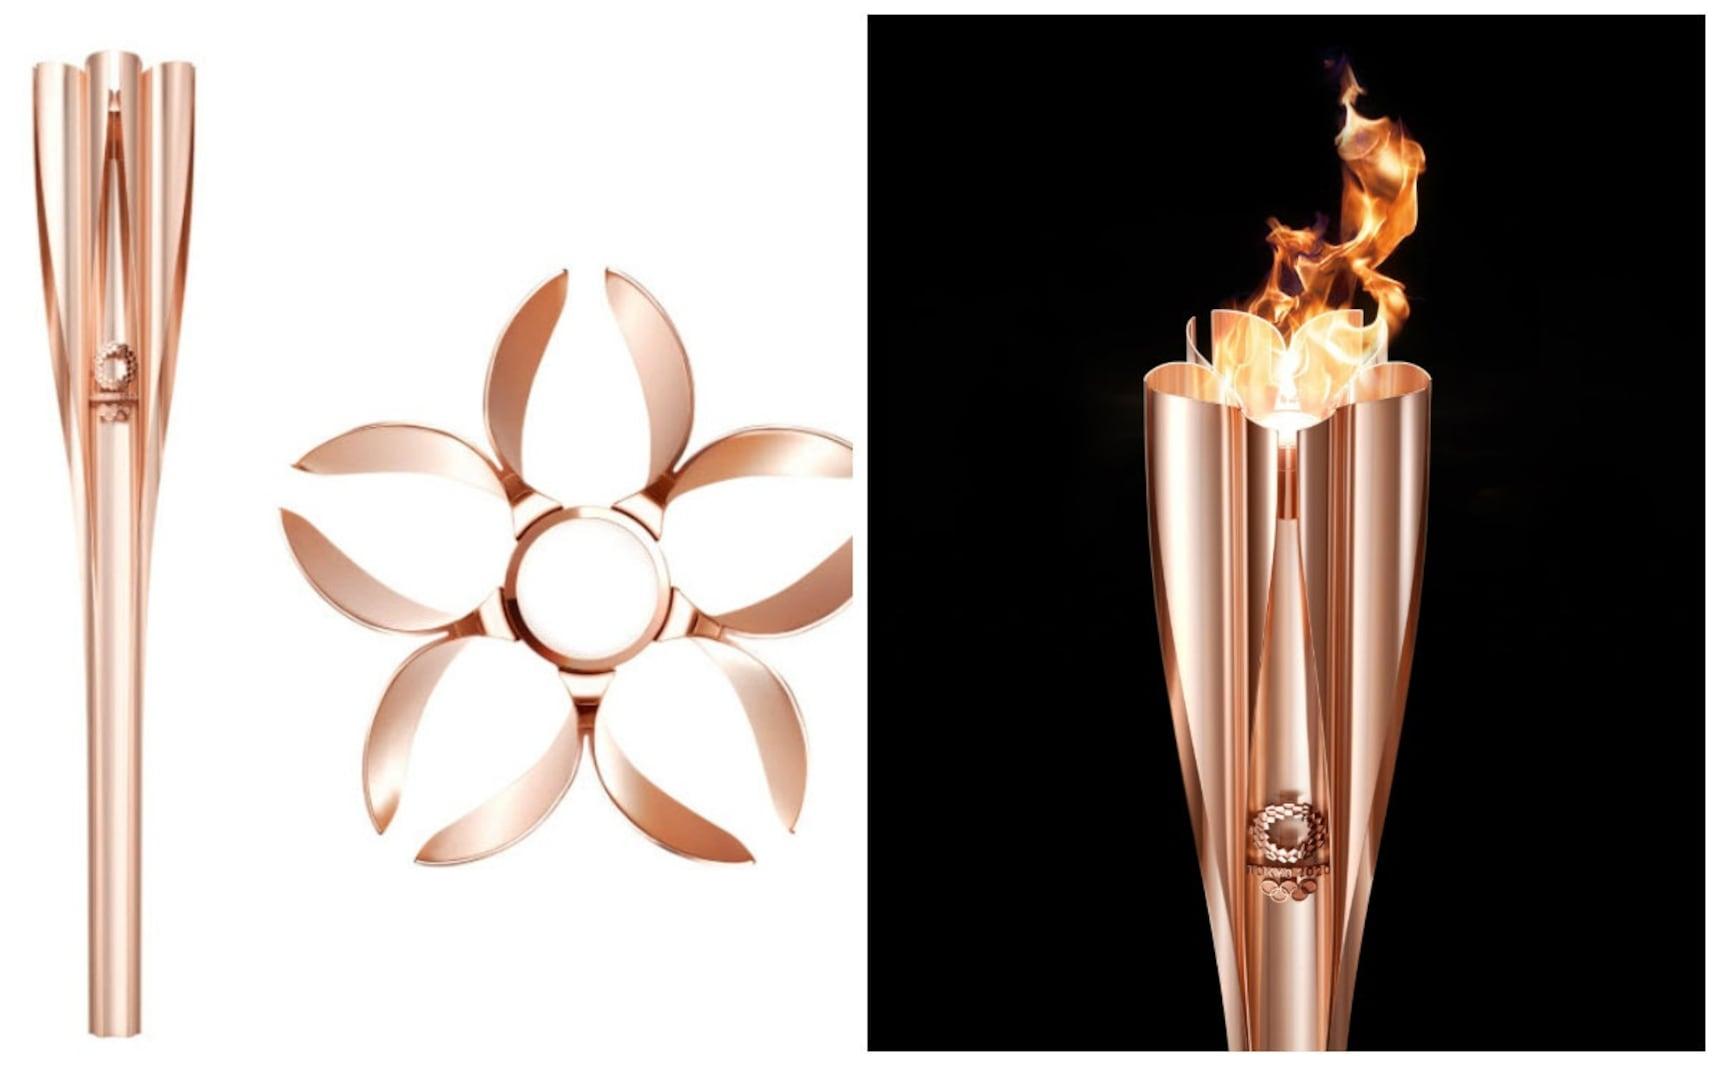 Sakura-Inspired Torch for the 2020 Olympics